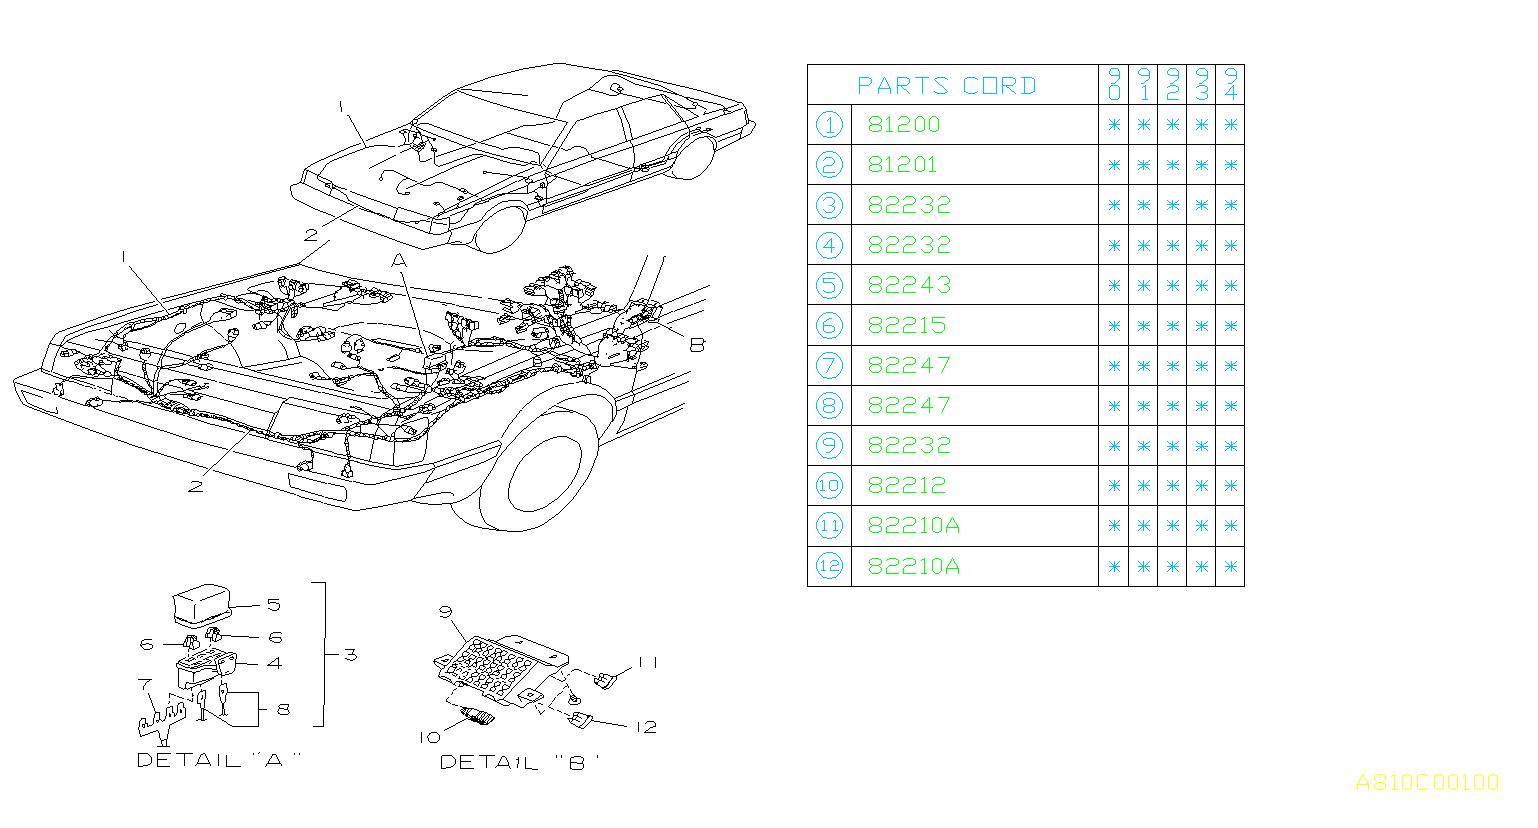 1991 Subaru Loyale Turbo Sedan Fusible Link  Red  Harness  Wiring  Main - 782301020